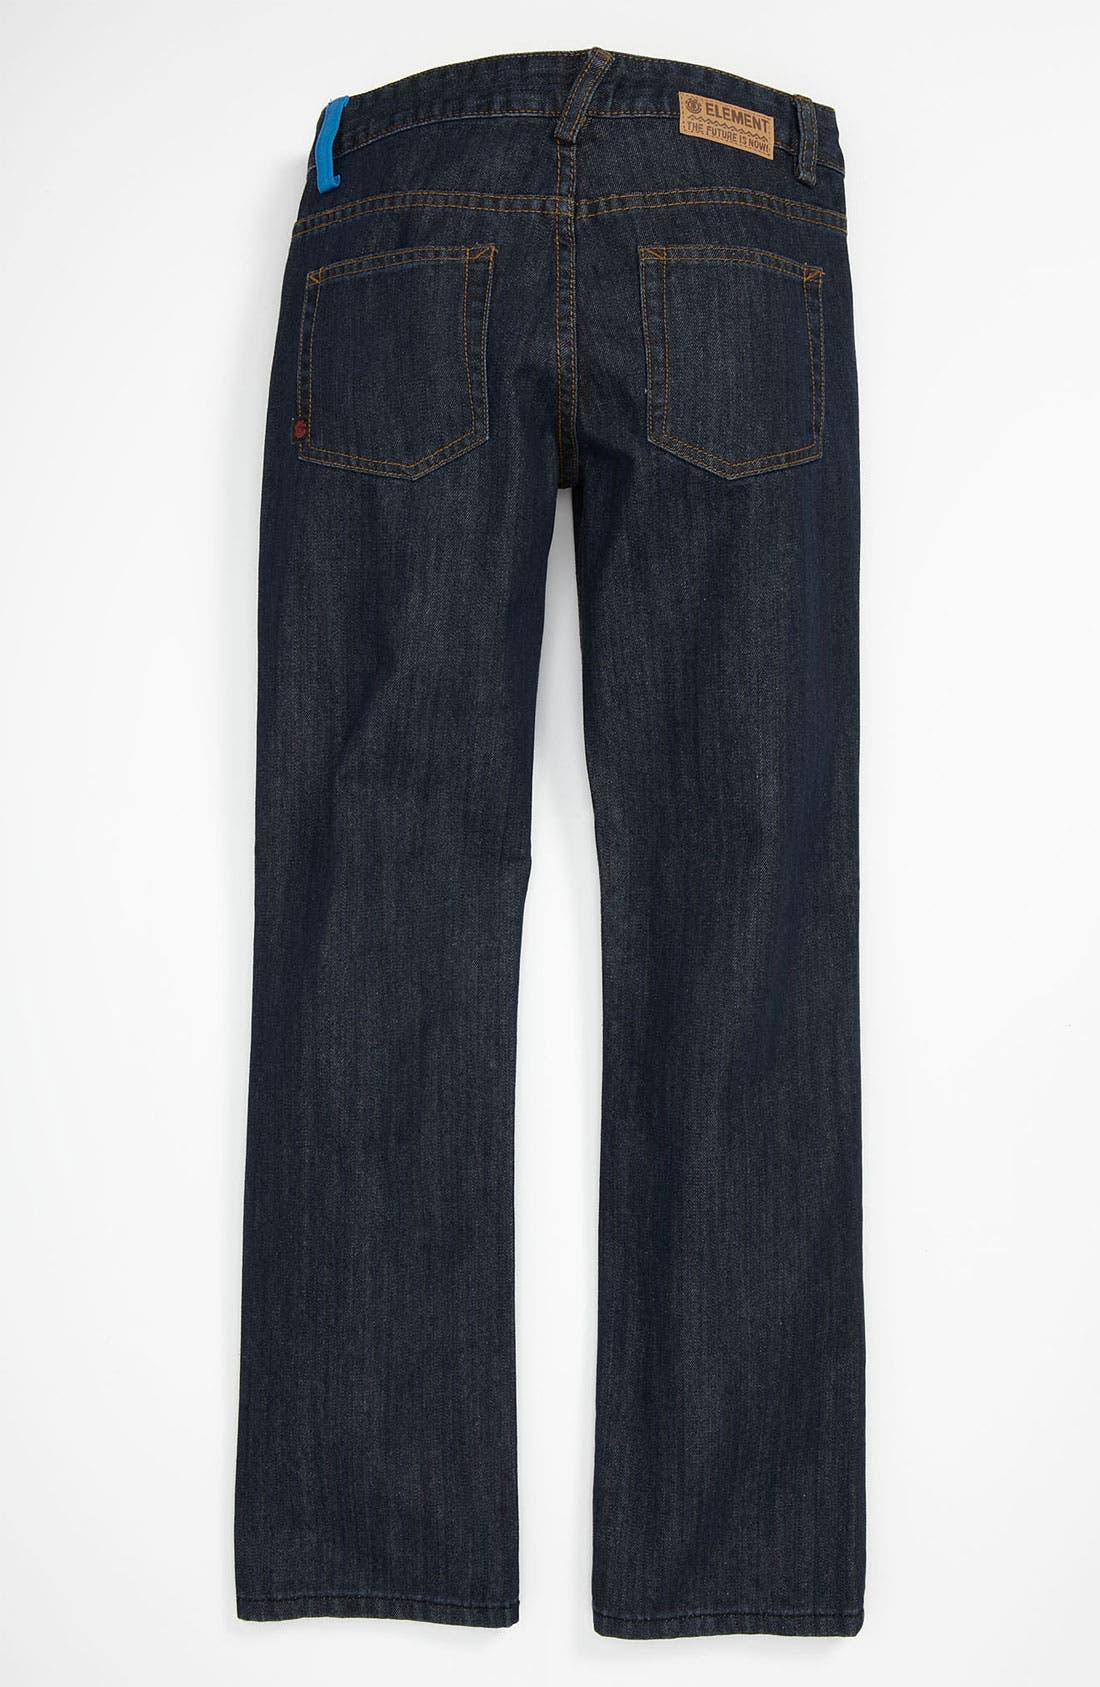 Alternate Image 1 Selected - Element 'Wyatt' Straight Leg Jeans (Big Boys)